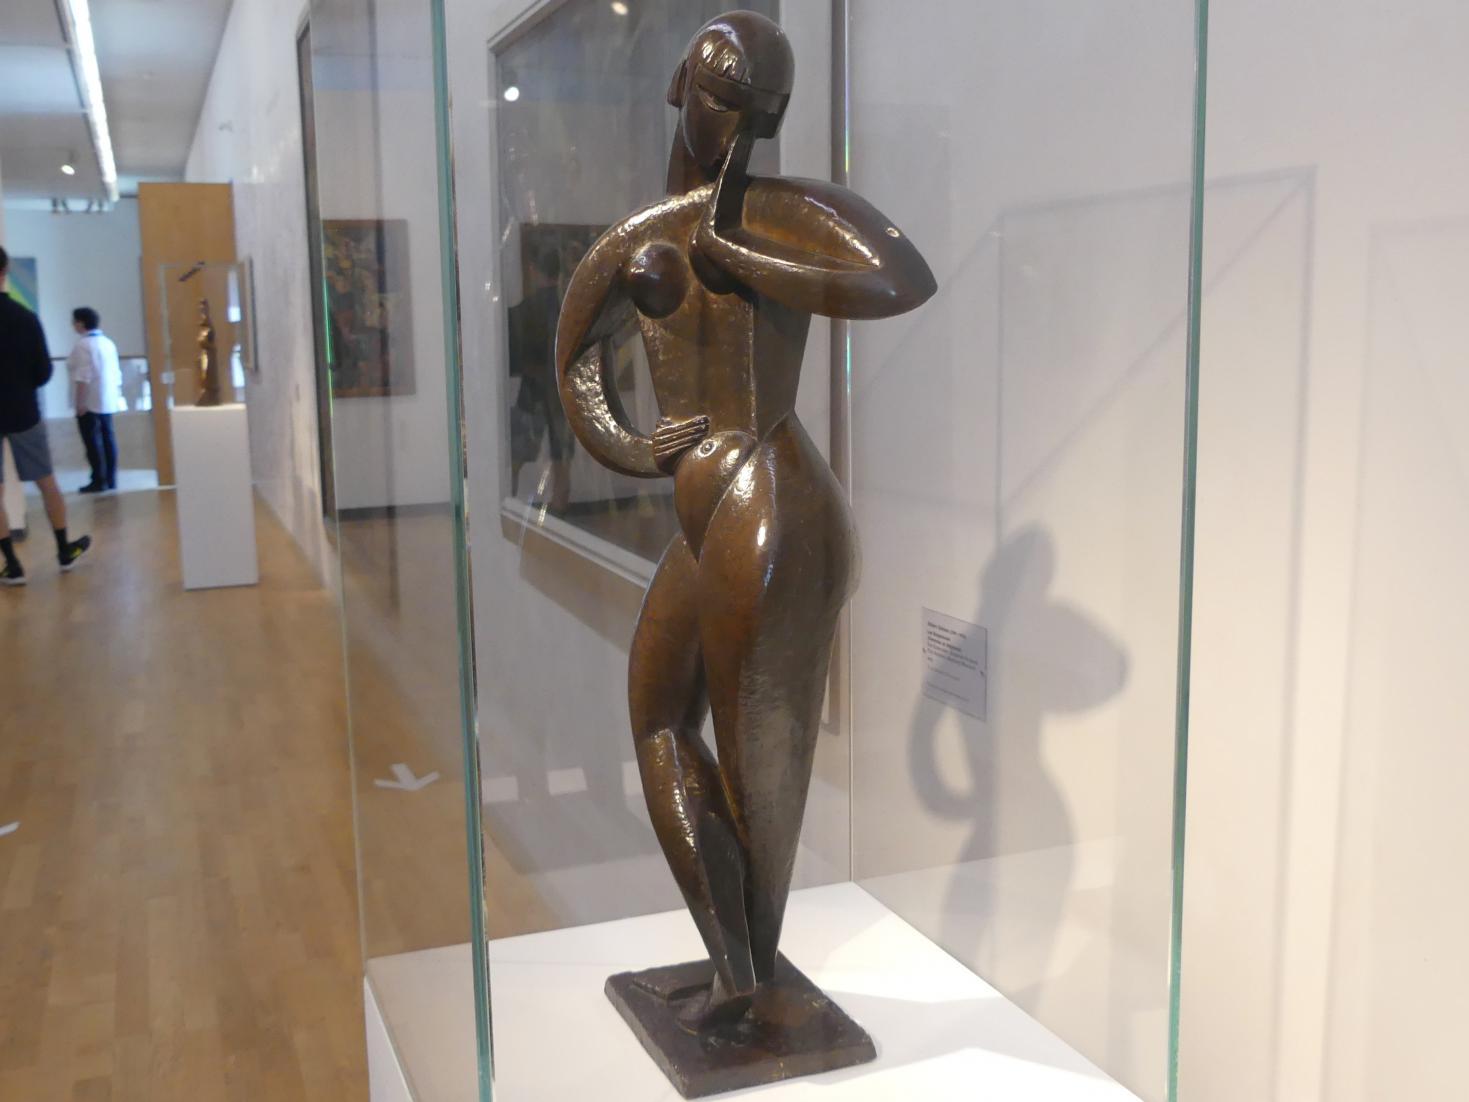 Jacques Lipchitz: Tänzerin, 1913, Bild 2/4